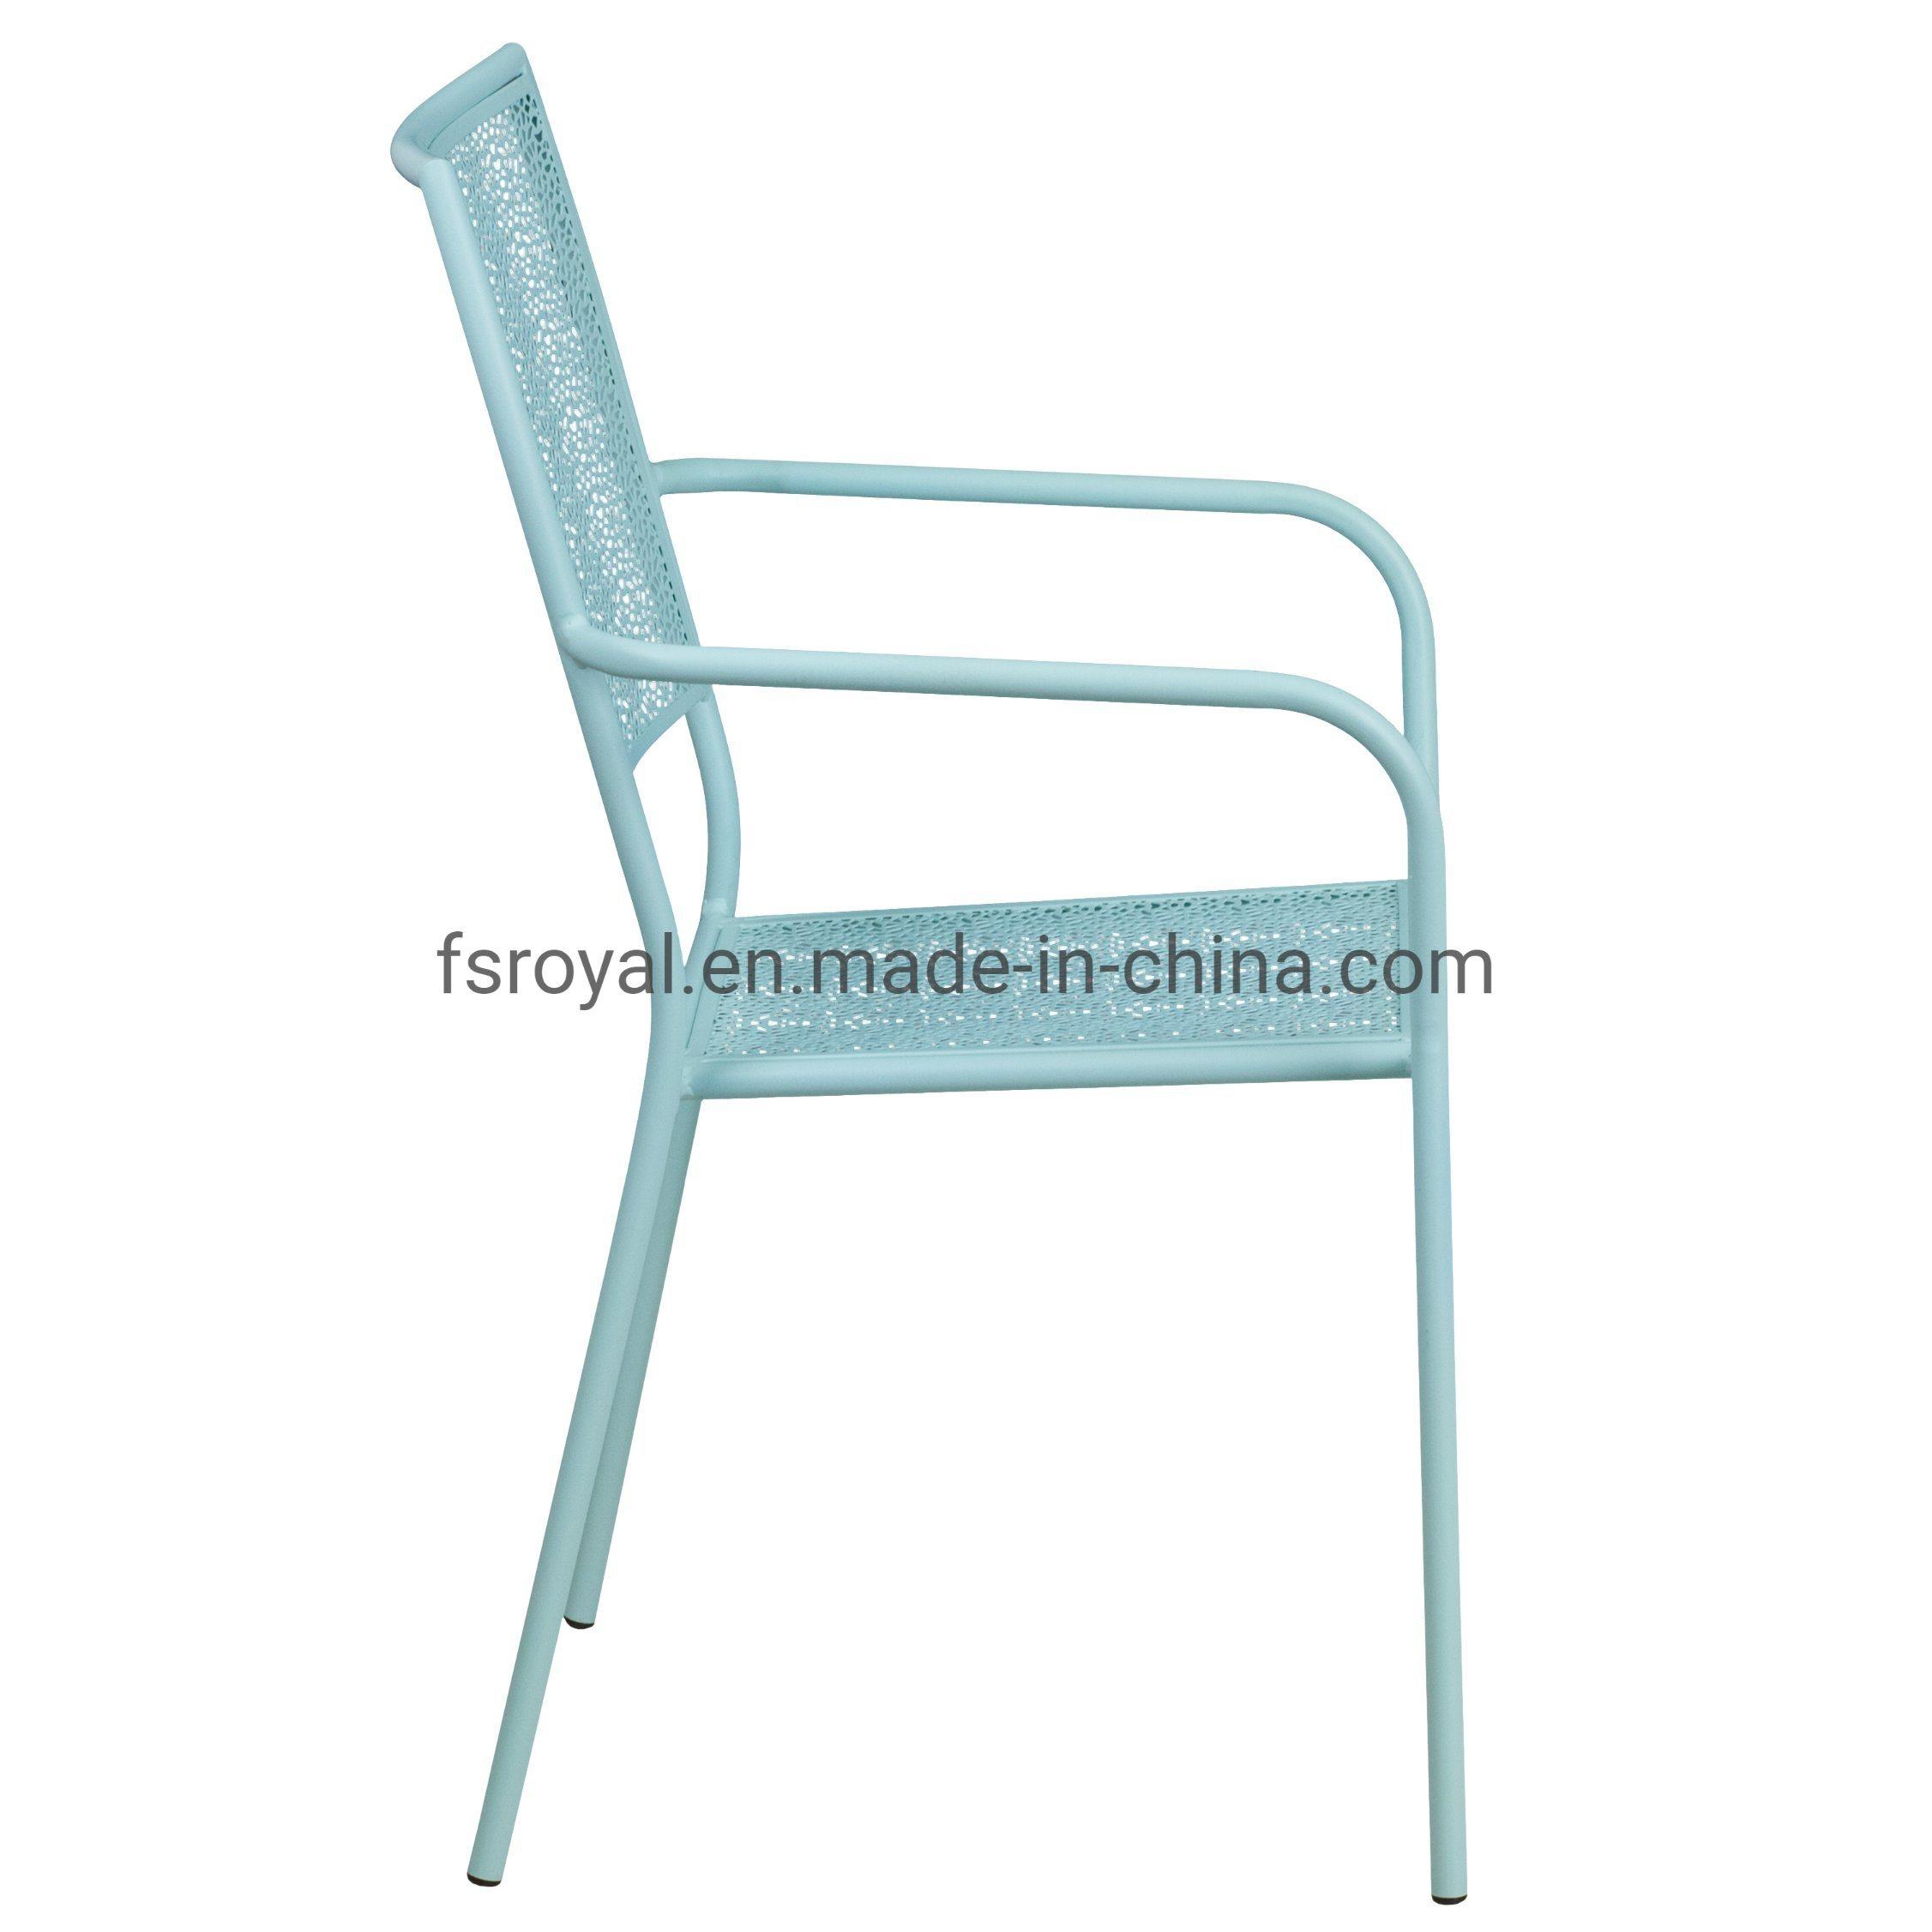 china manufacturer of wrought iron